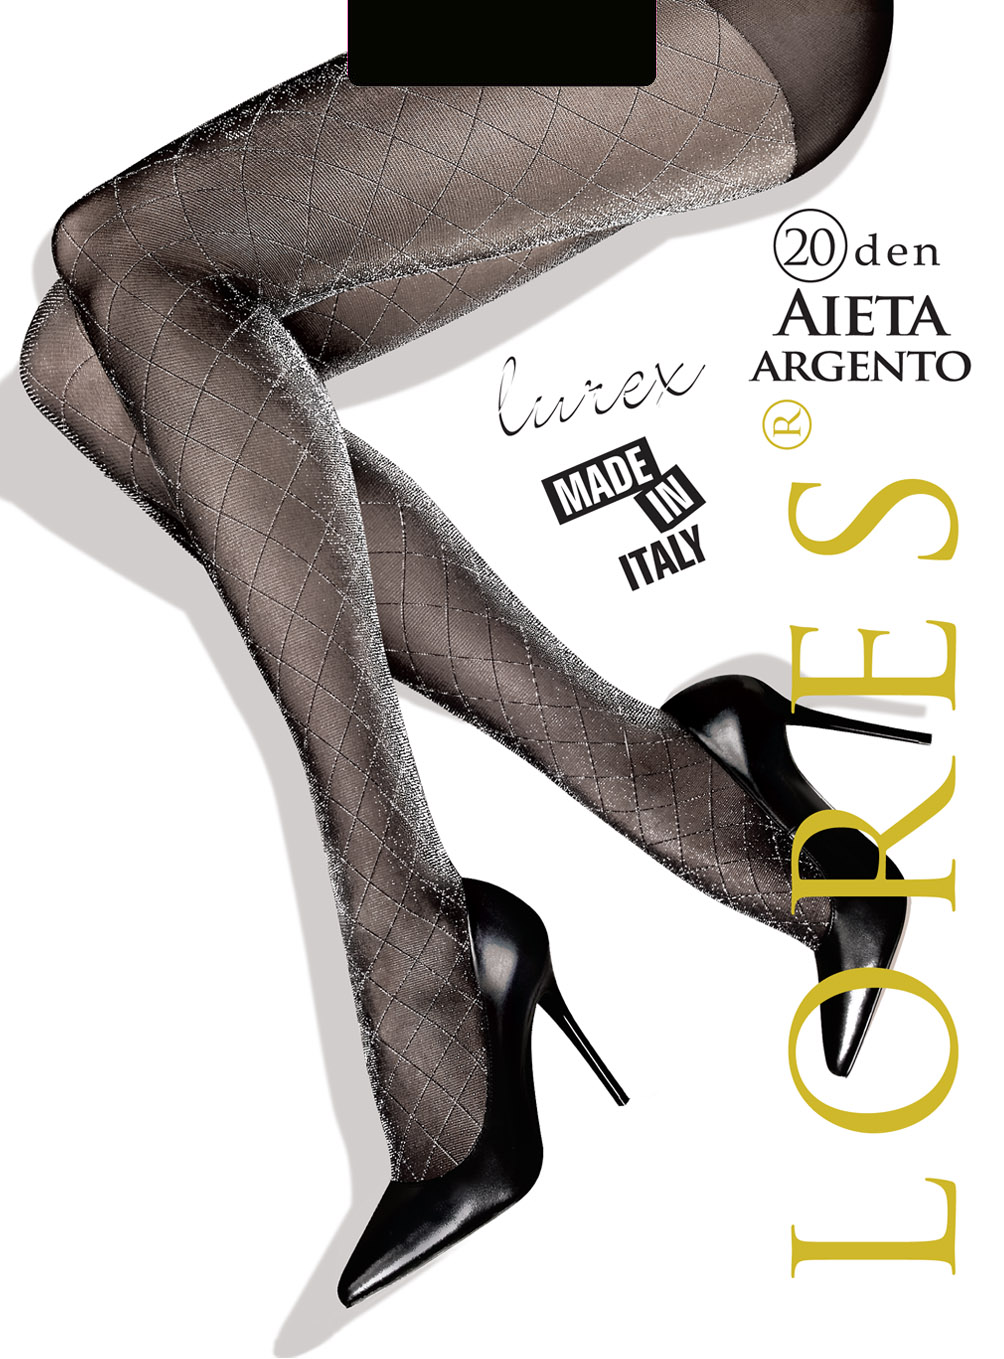 AIETA ARGENTO – błyszczące rajstopy ze wzorem – 20 den